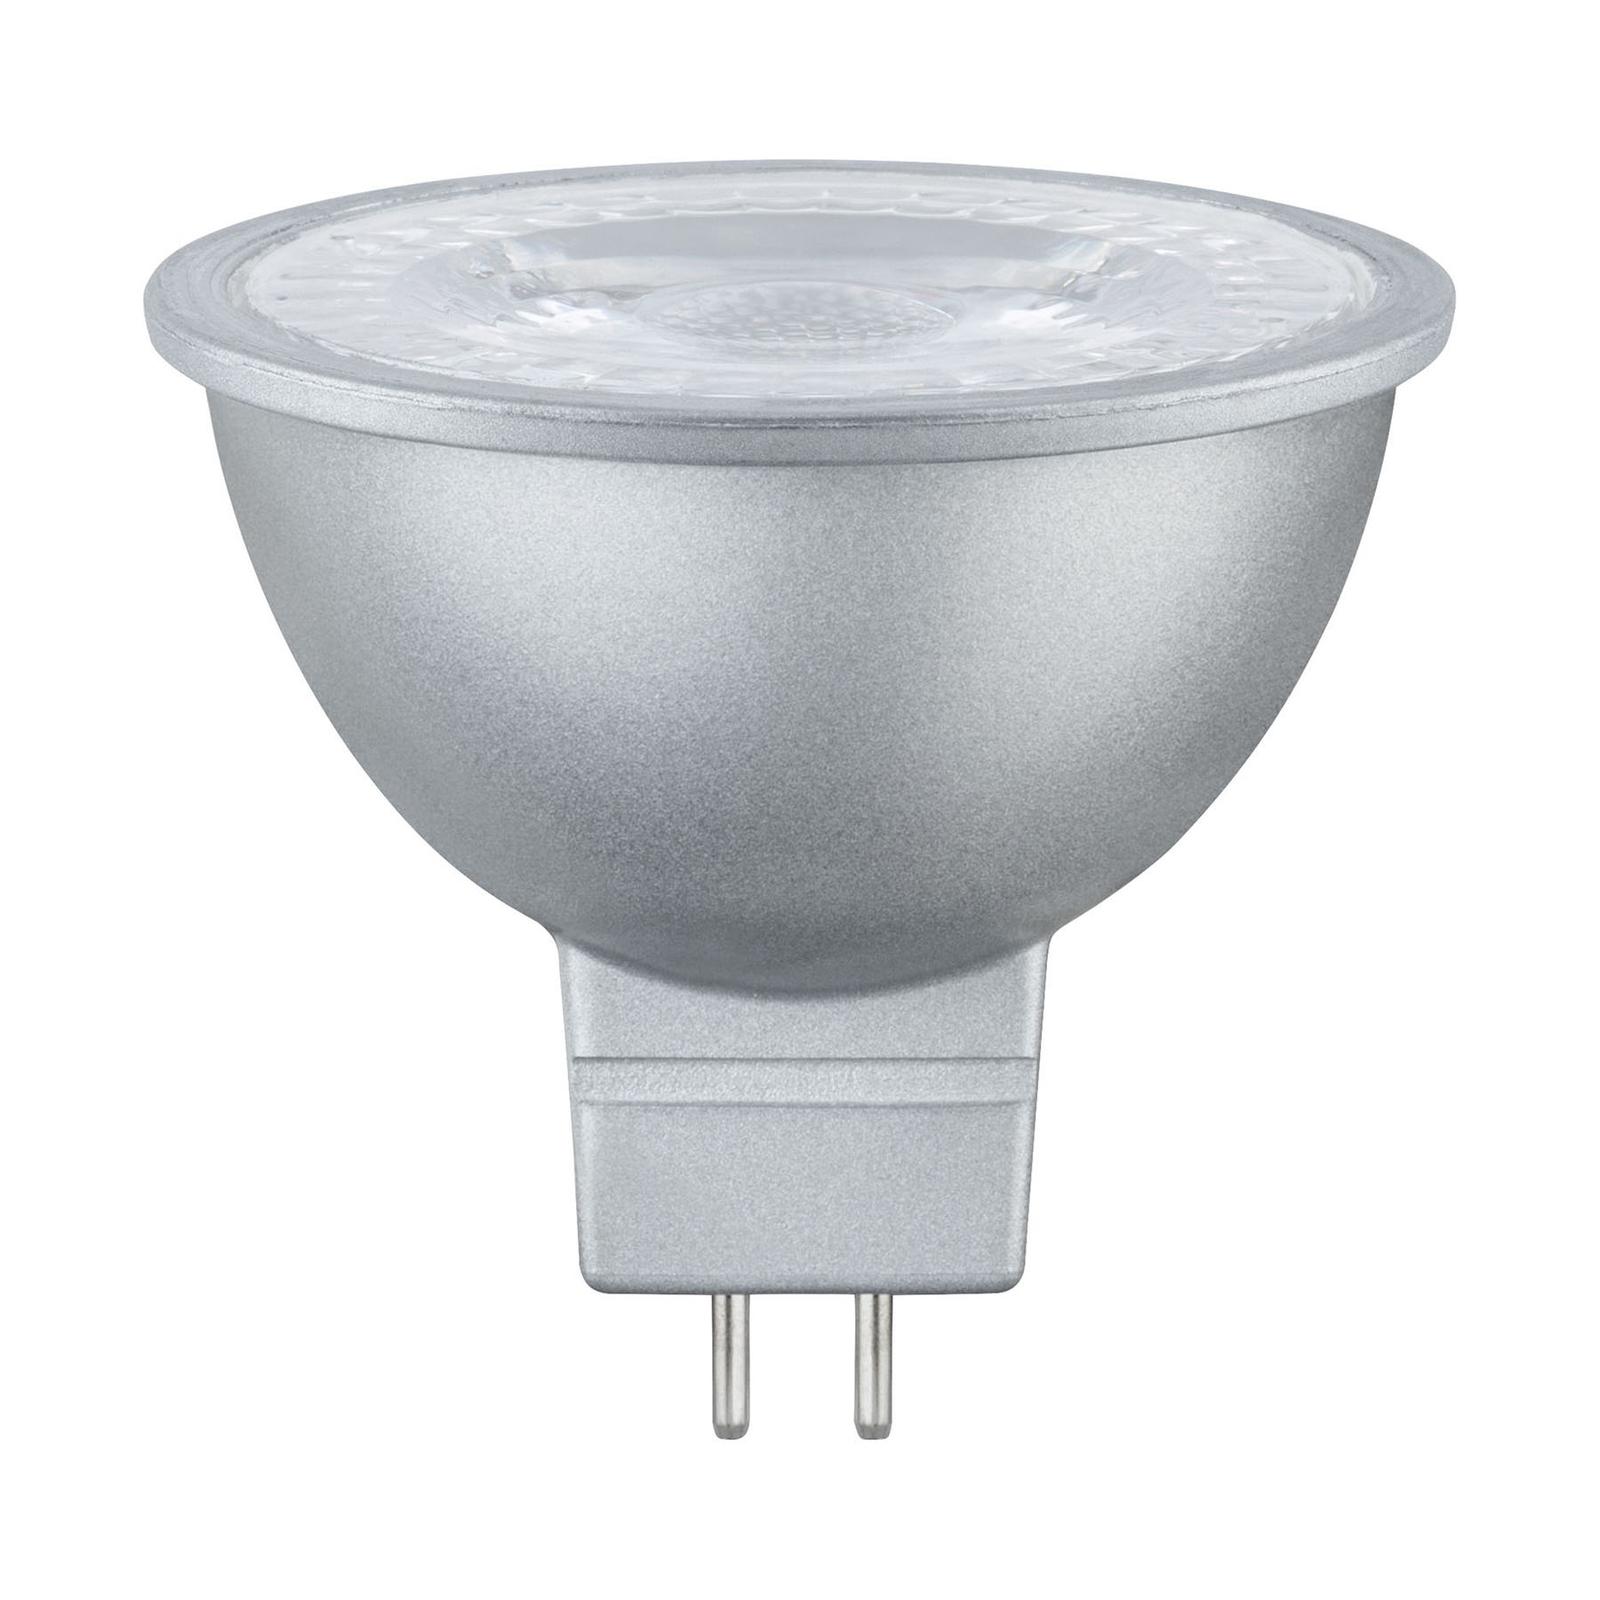 Paulmann LED-Reflektor GU5,3 6,5W 827 dim chrom